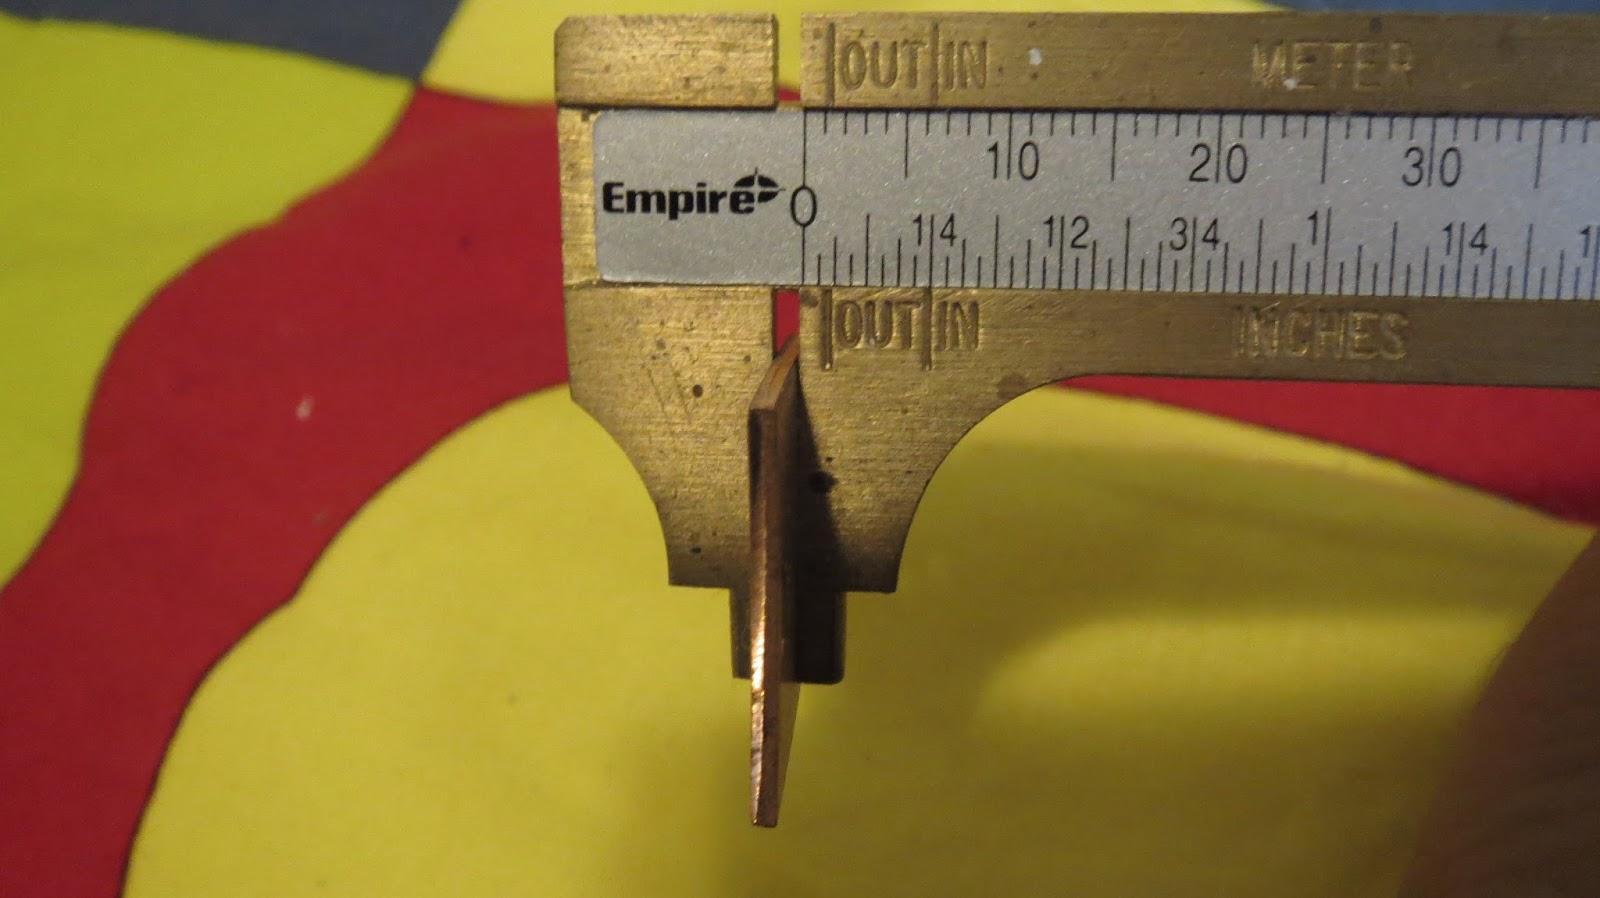 Dell latitude d630 nvidia quadro nvs 135m